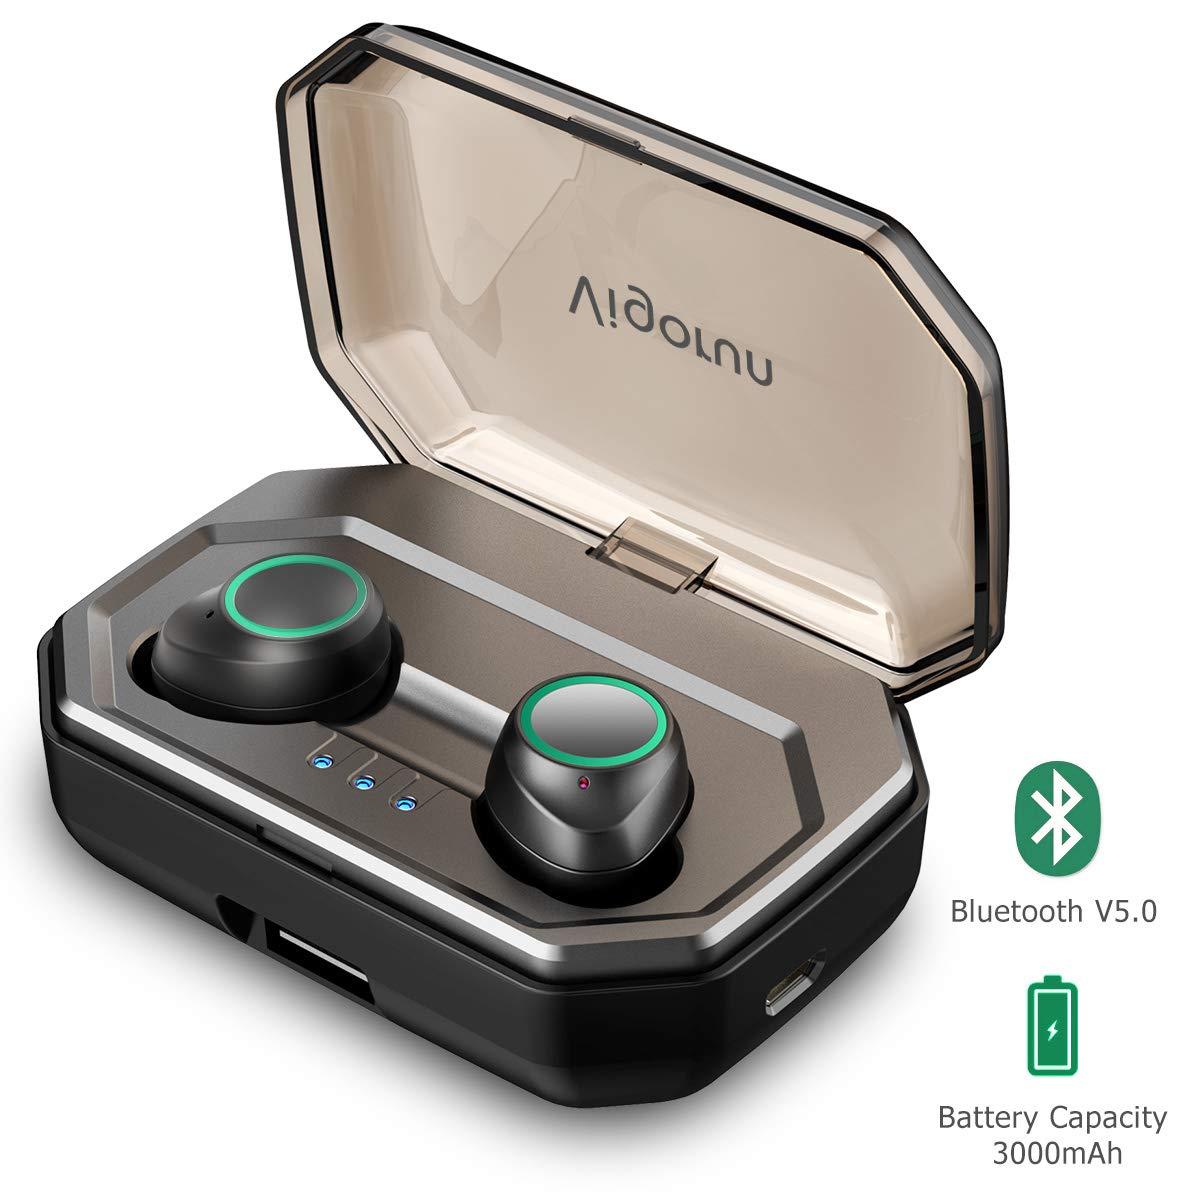 Auricolari Bluetooth 5.0 e7f97486718f